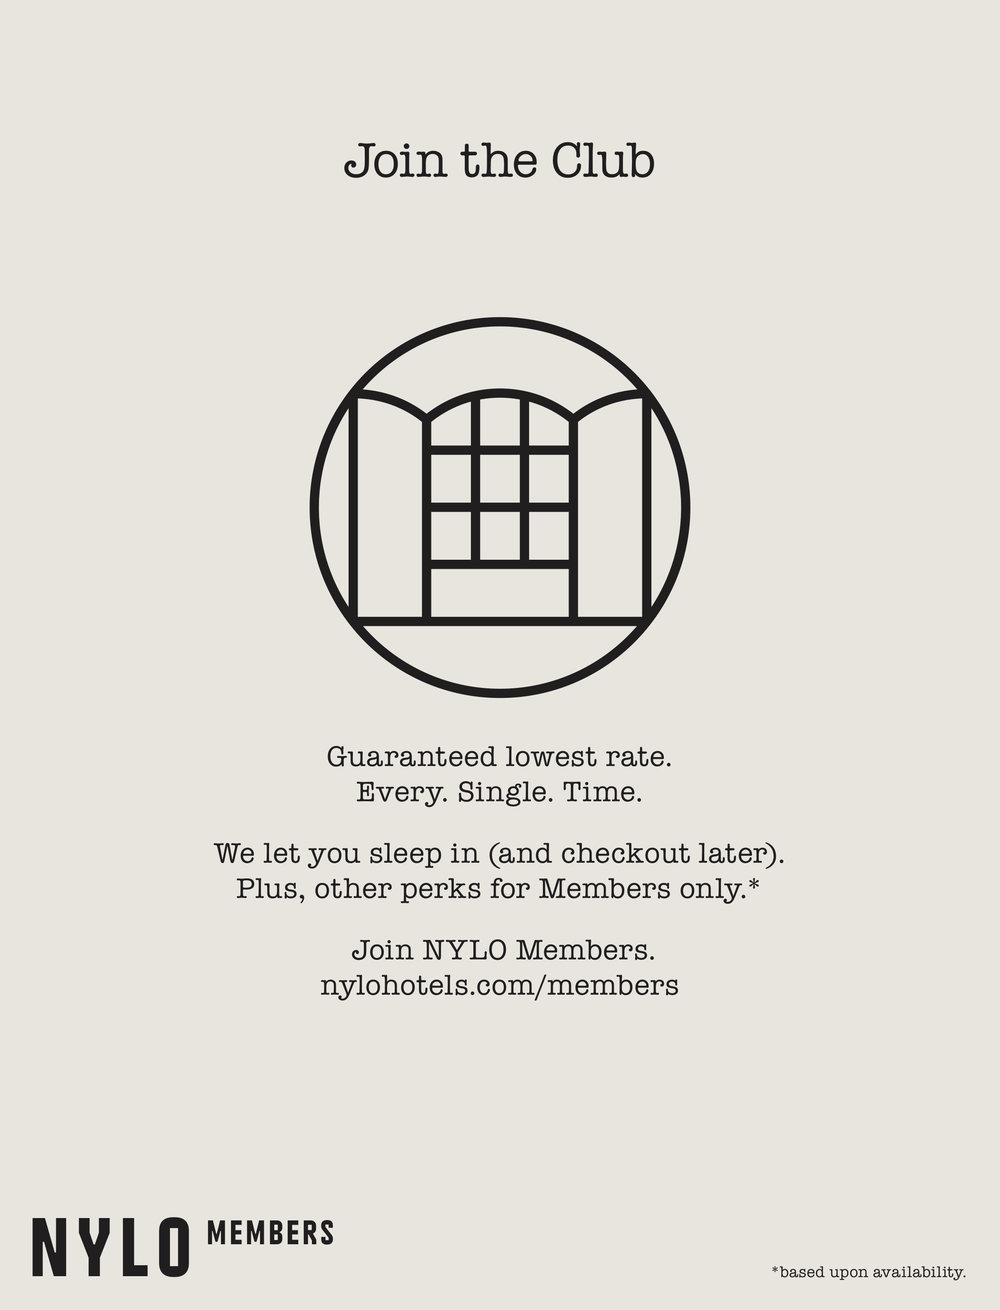 Plano_Members_Elevator_Sign (1).jpg